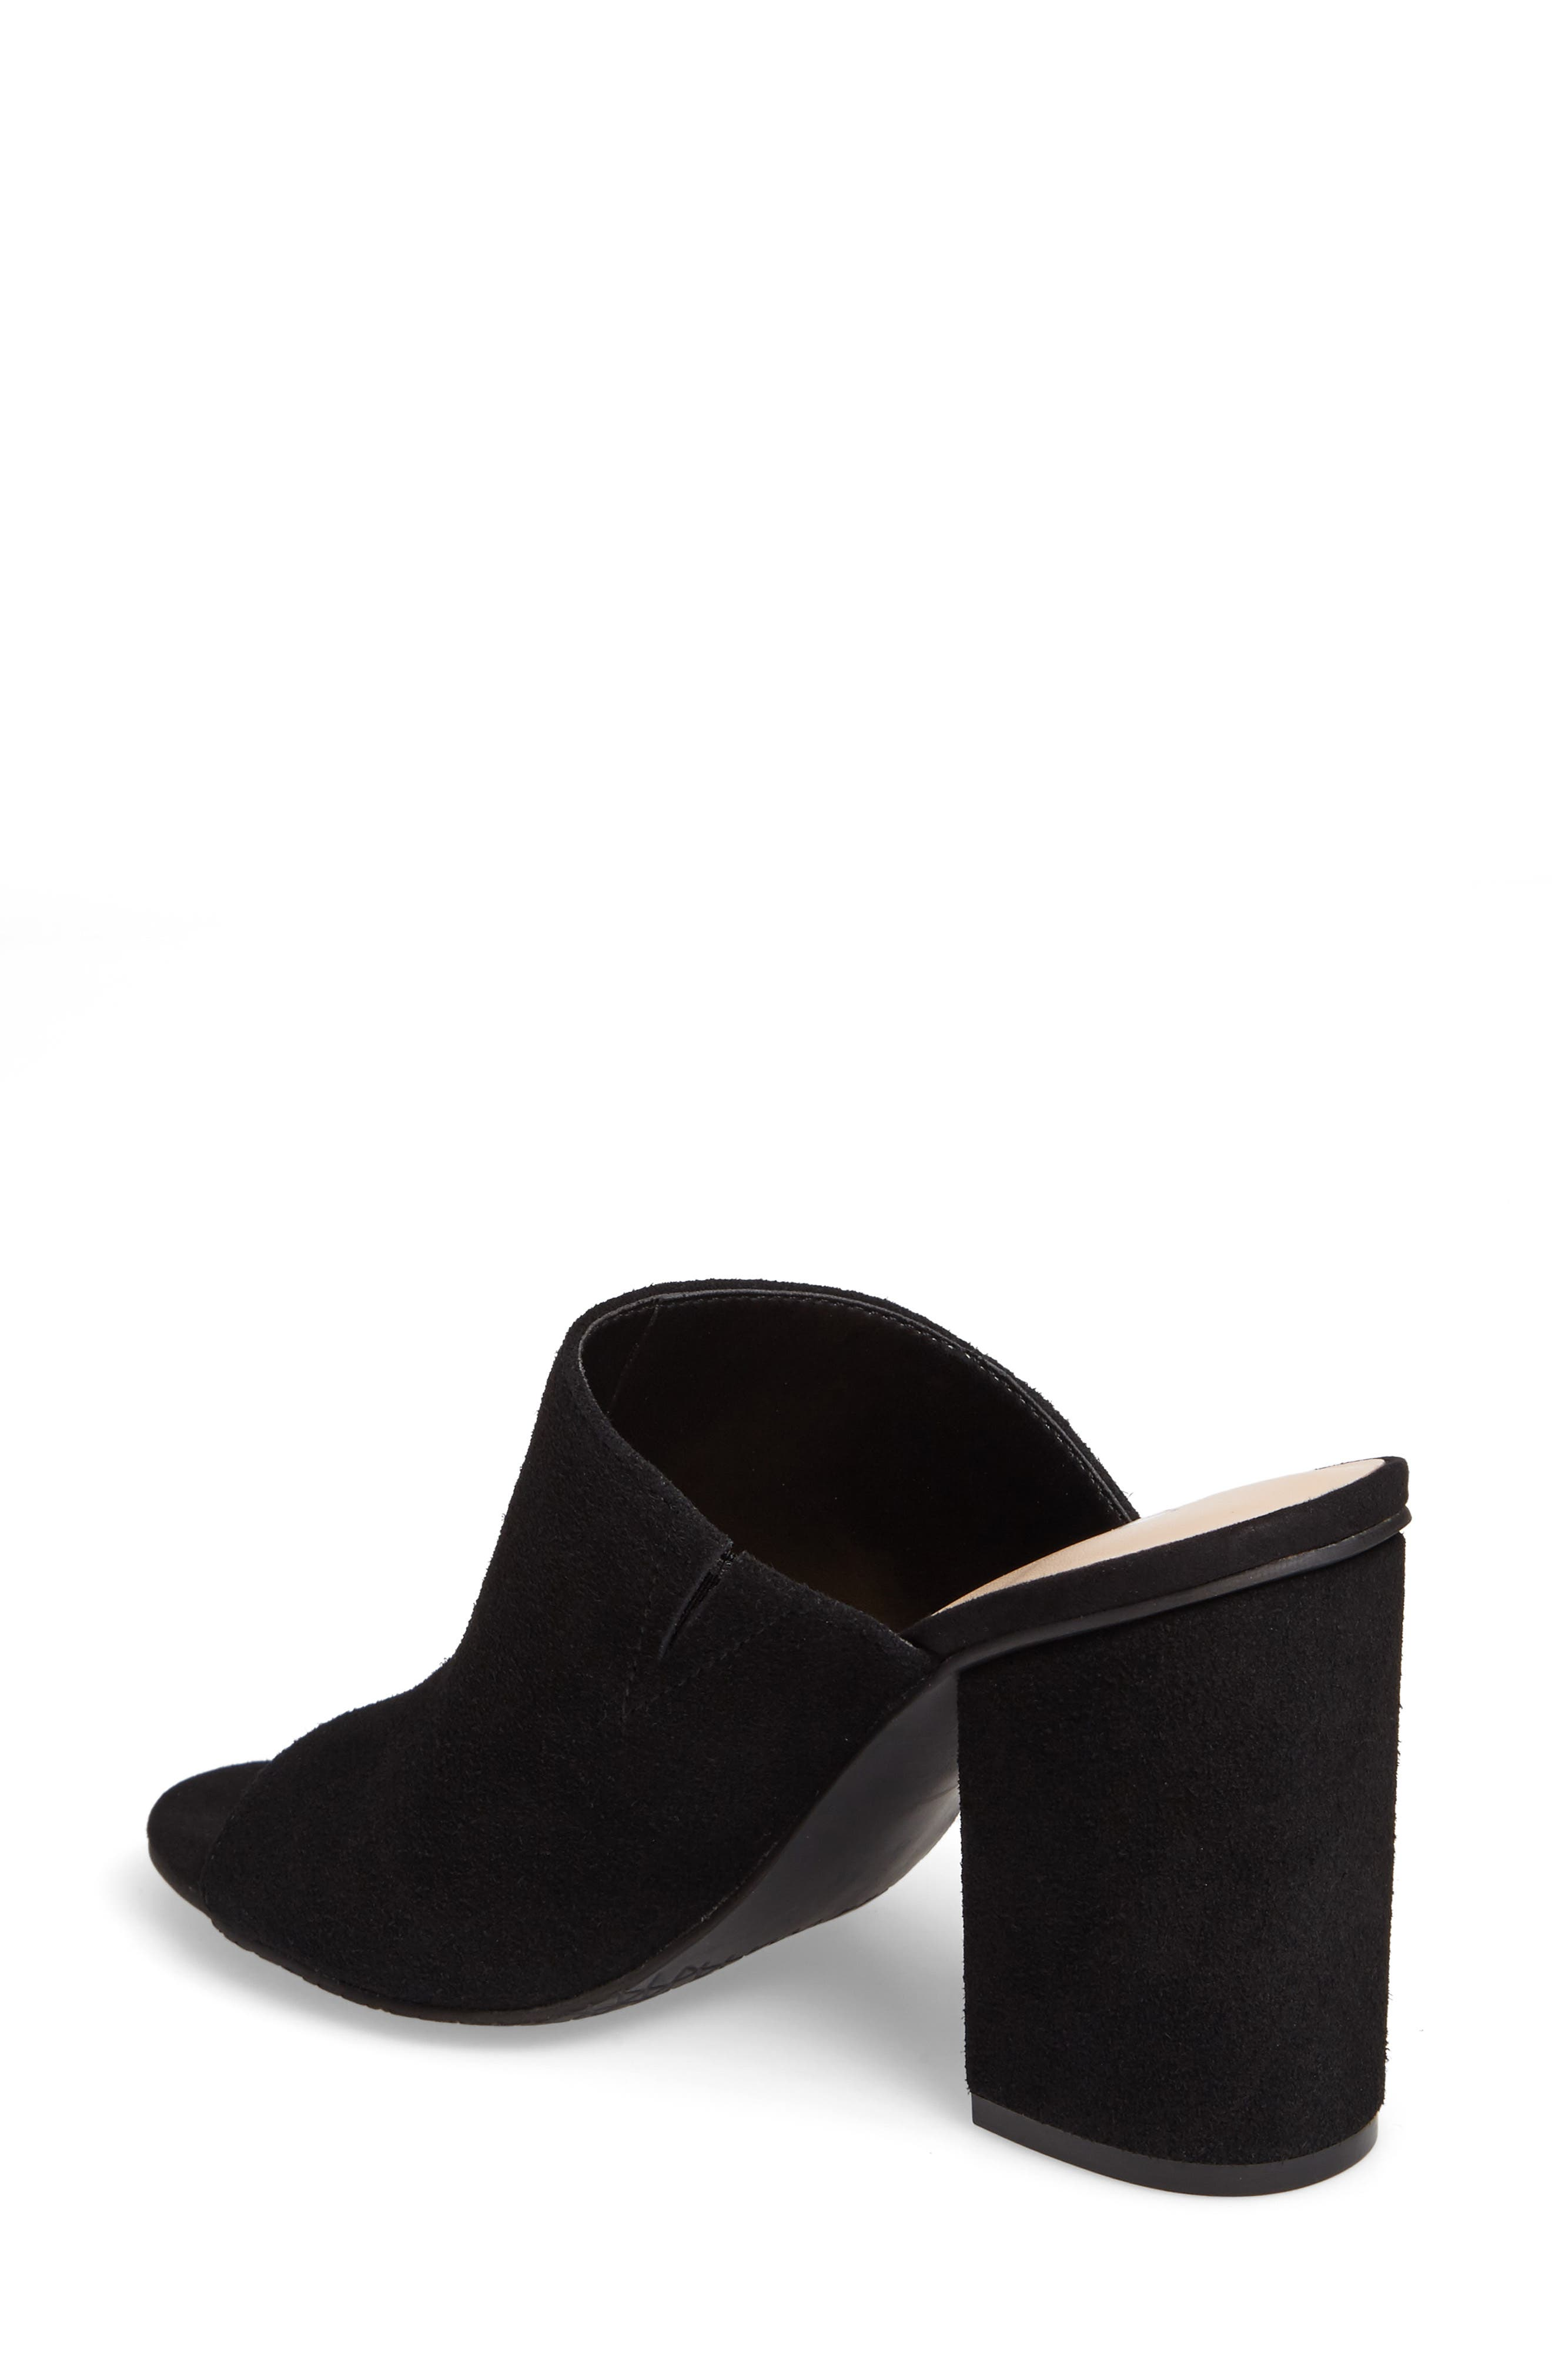 Tale Block Heel Sandal,                             Alternate thumbnail 2, color,                             001